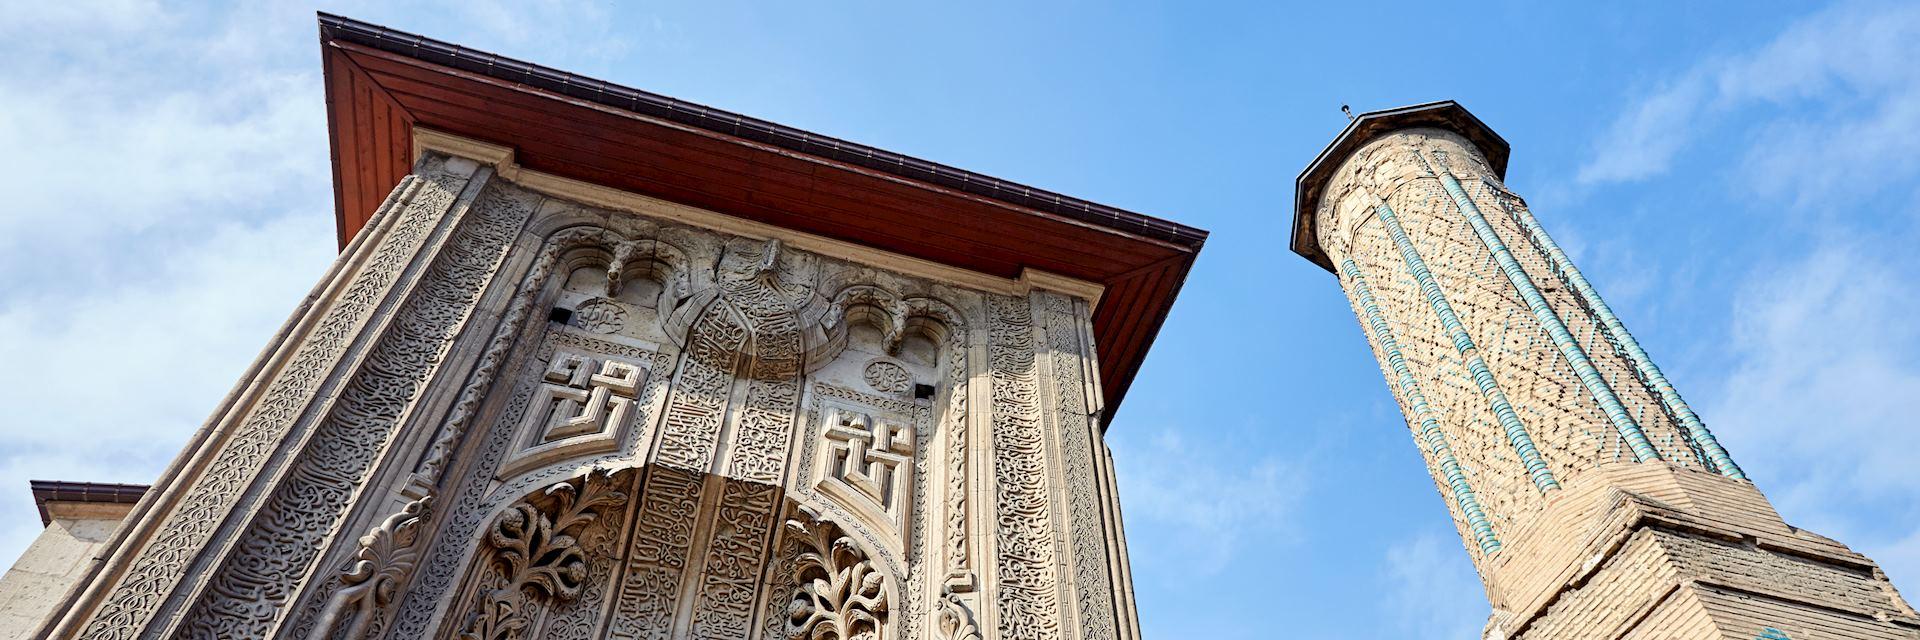 İnce Minareli Medrese, Konya